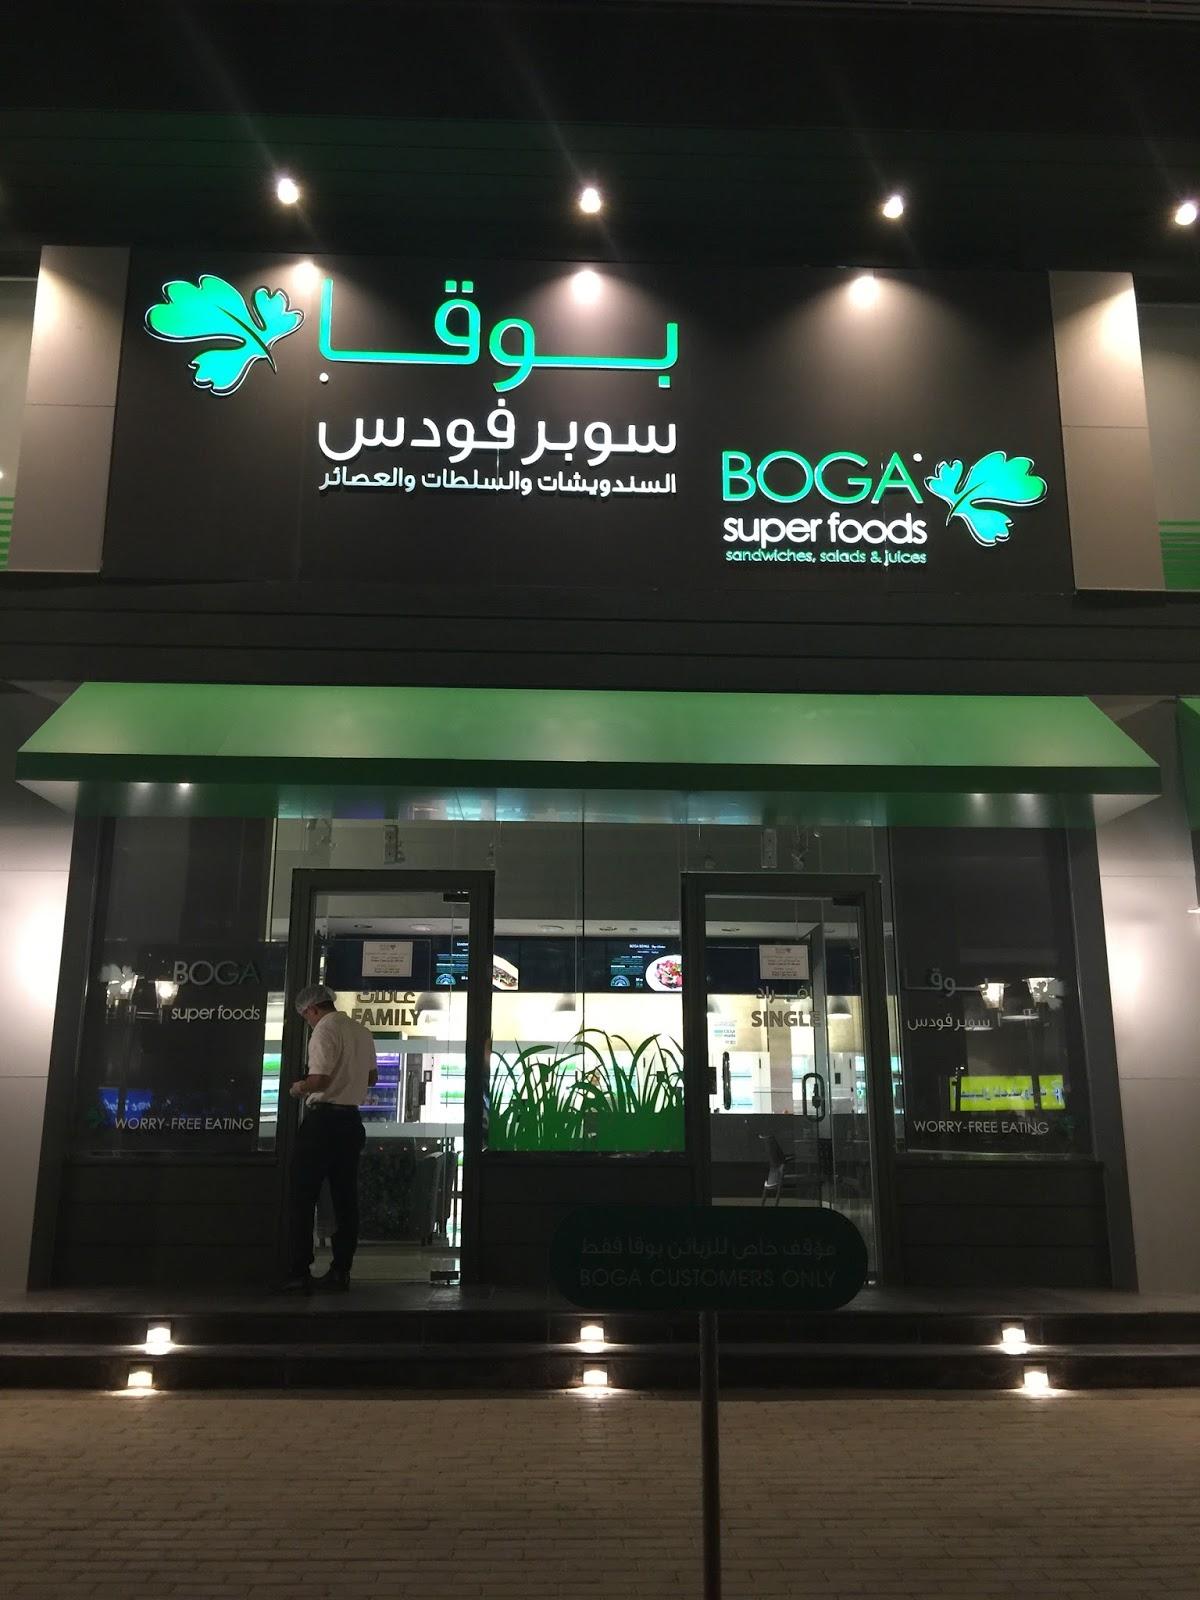 Maram Ghurab حياة صحية مطعم بوقا سوبرفودس Boga Super Foods